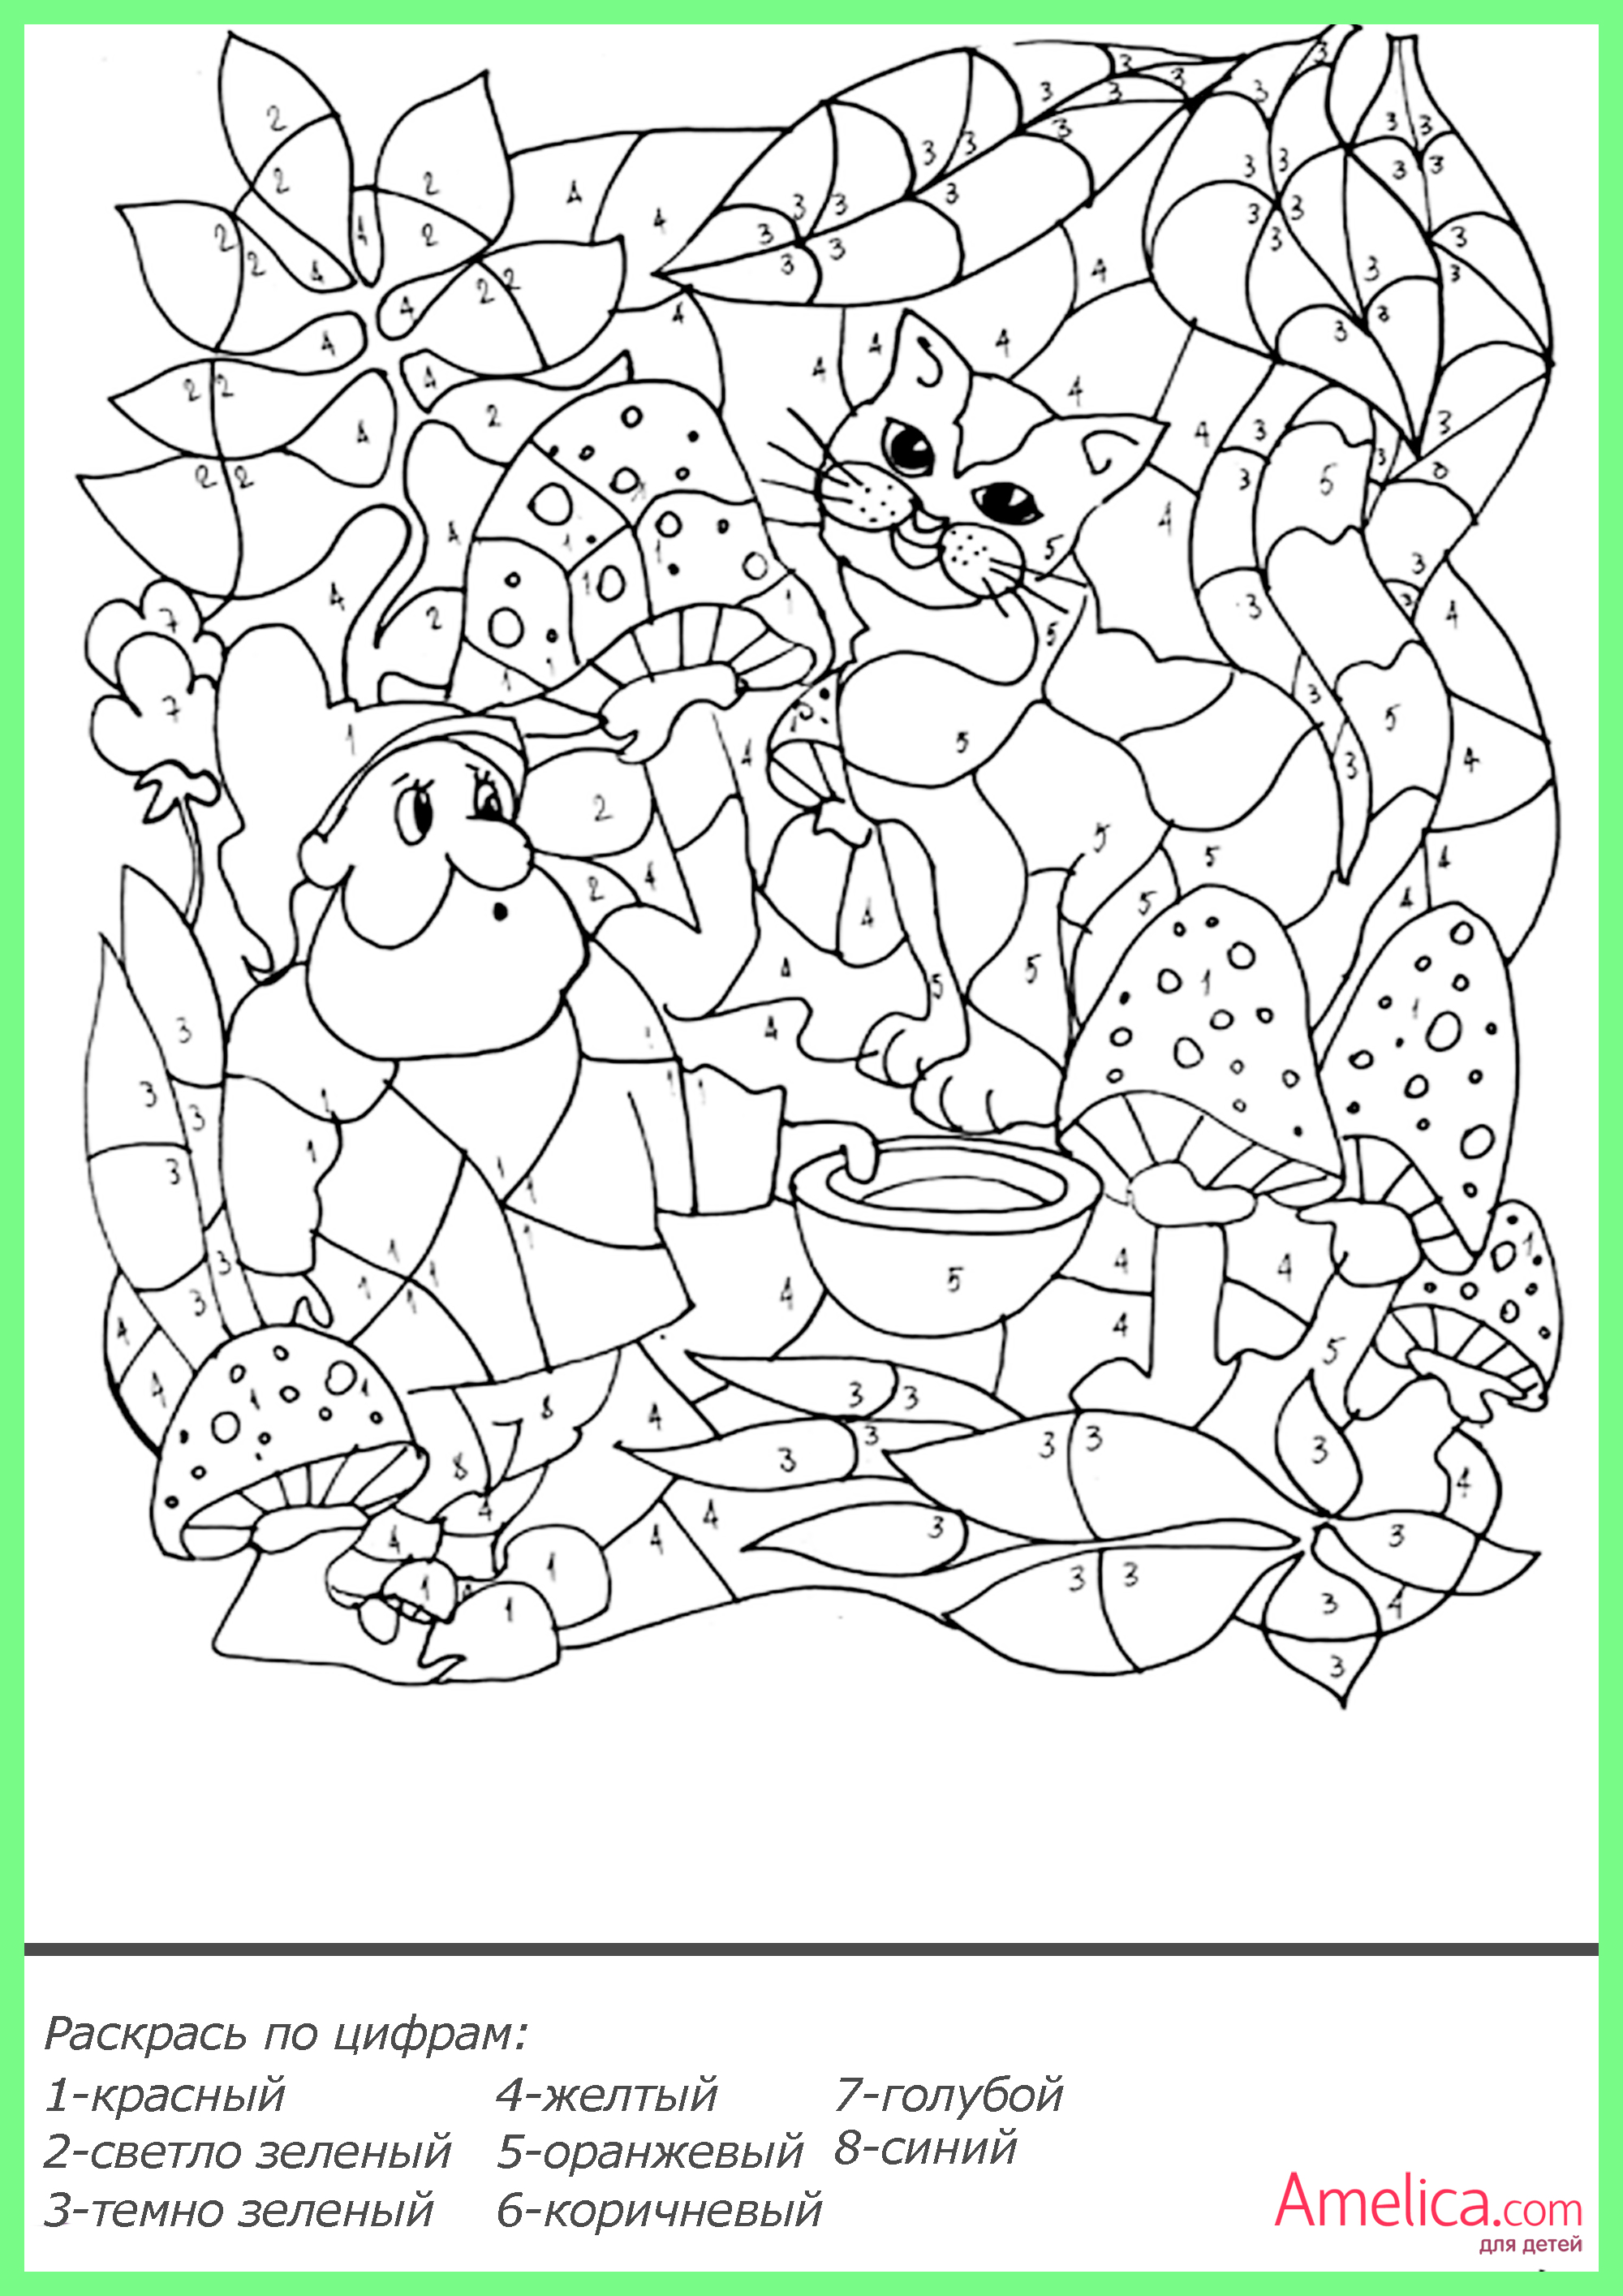 раскраска с цифрами для малышей онлайн